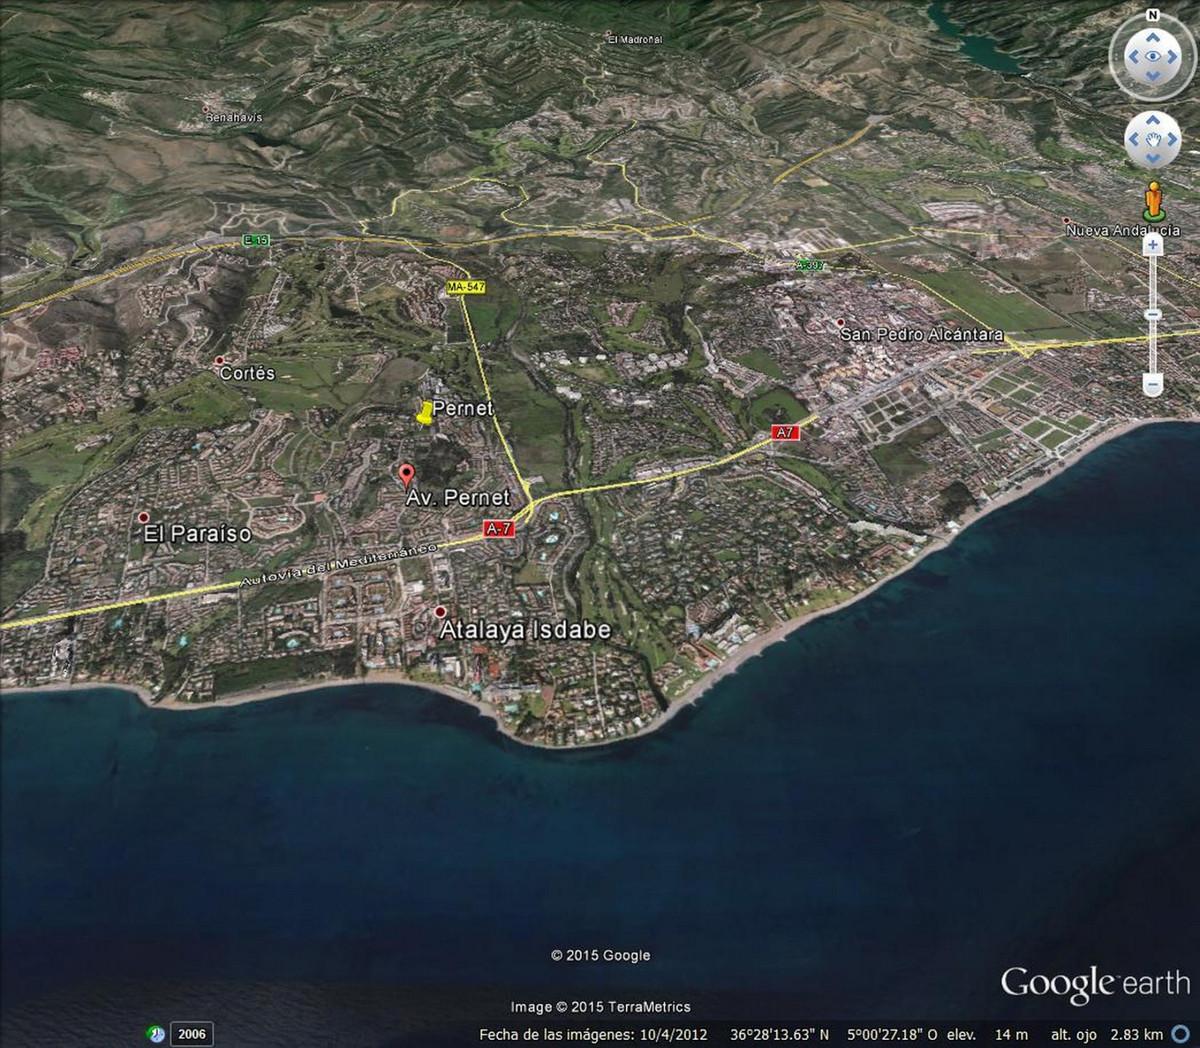 R3766117 | Residential Plot in Estepona – € 1,400,000 – 0 beds, 0 baths